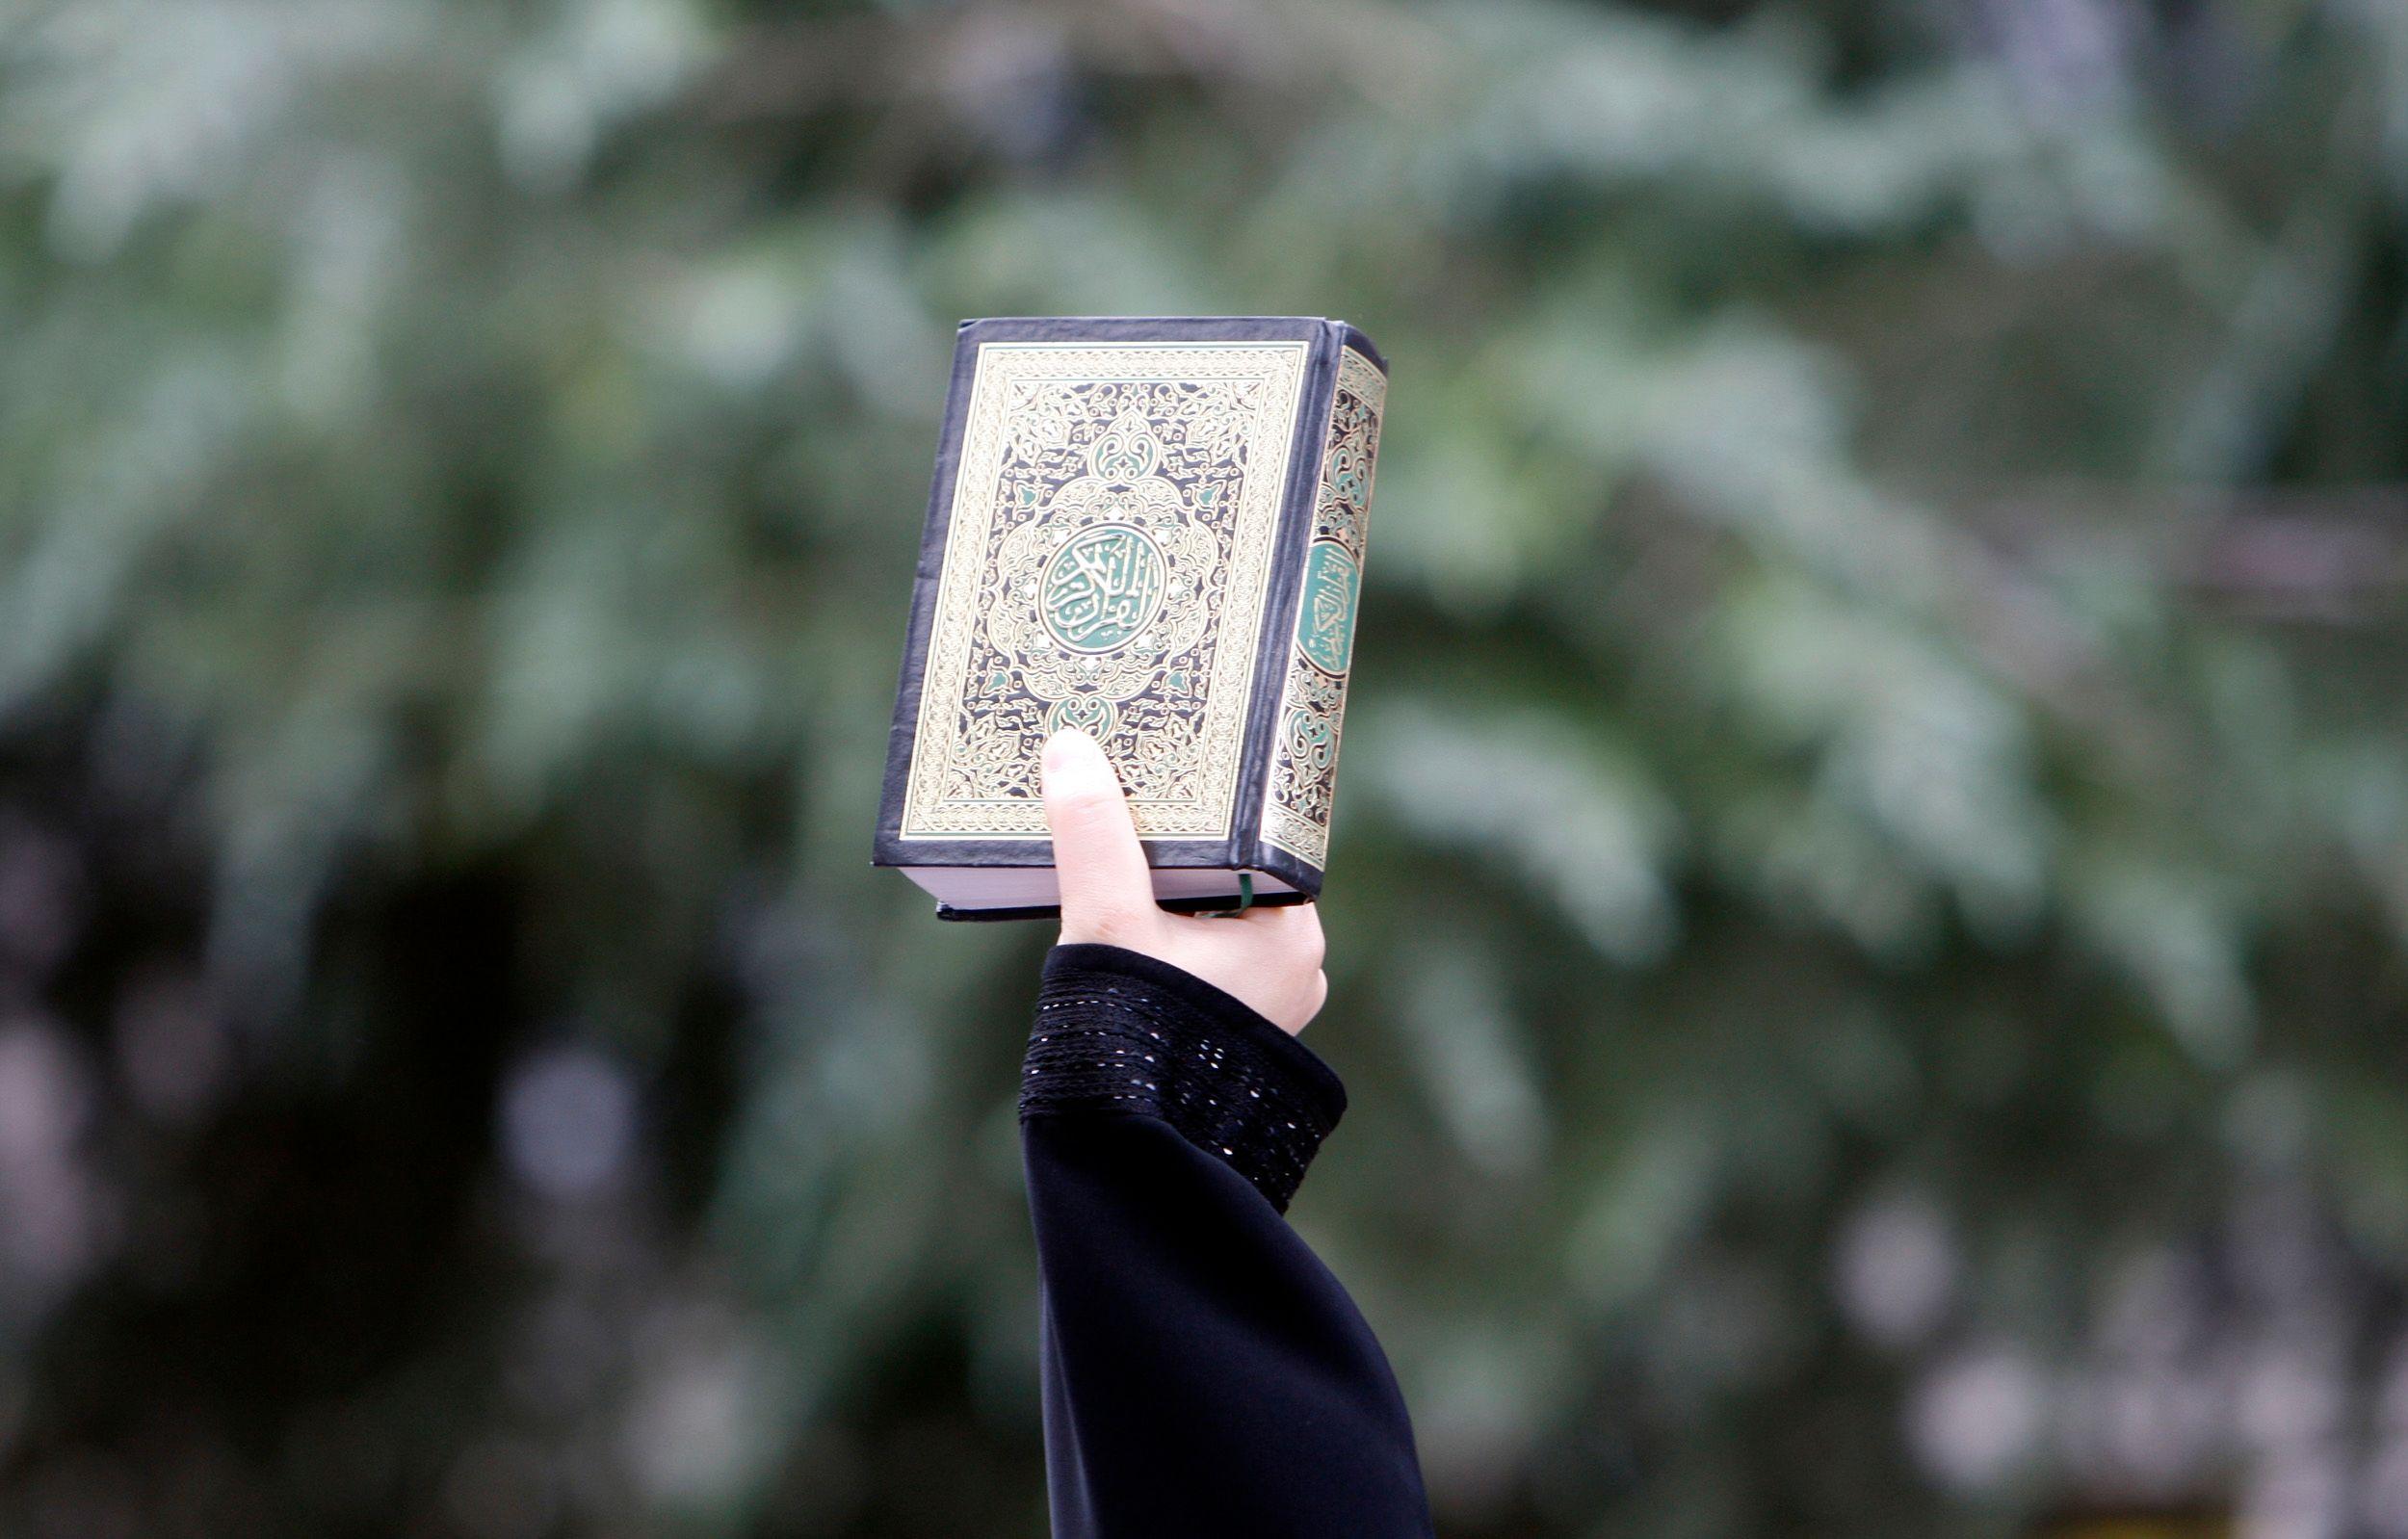 Des versets du Coran.